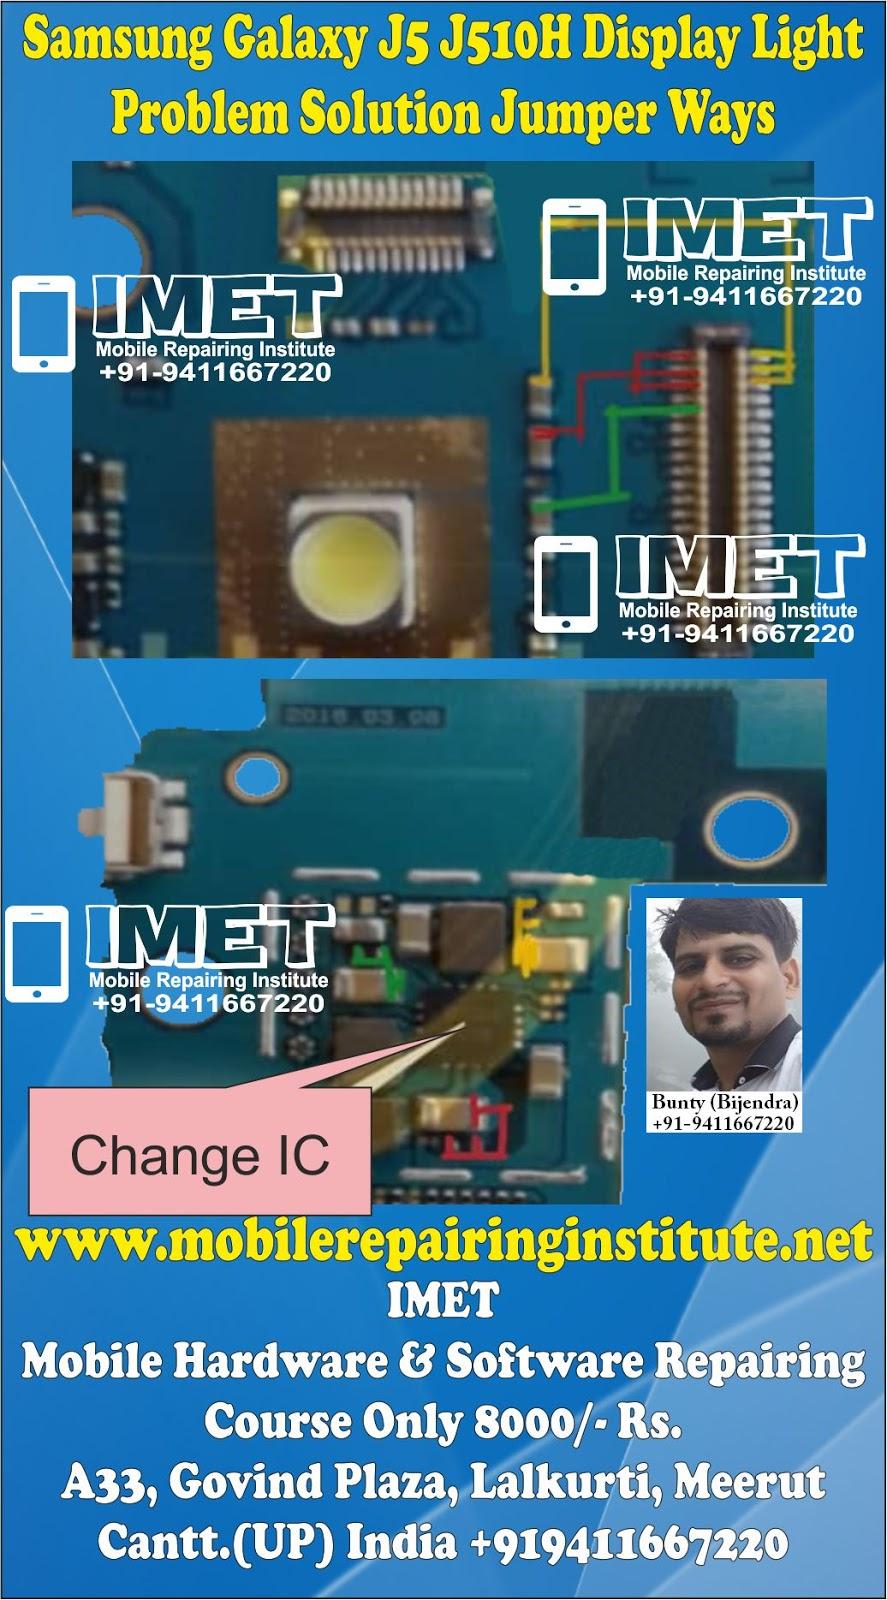 Samsung Galaxy J5 J510H Display Light Problem Solution Jumper Ways